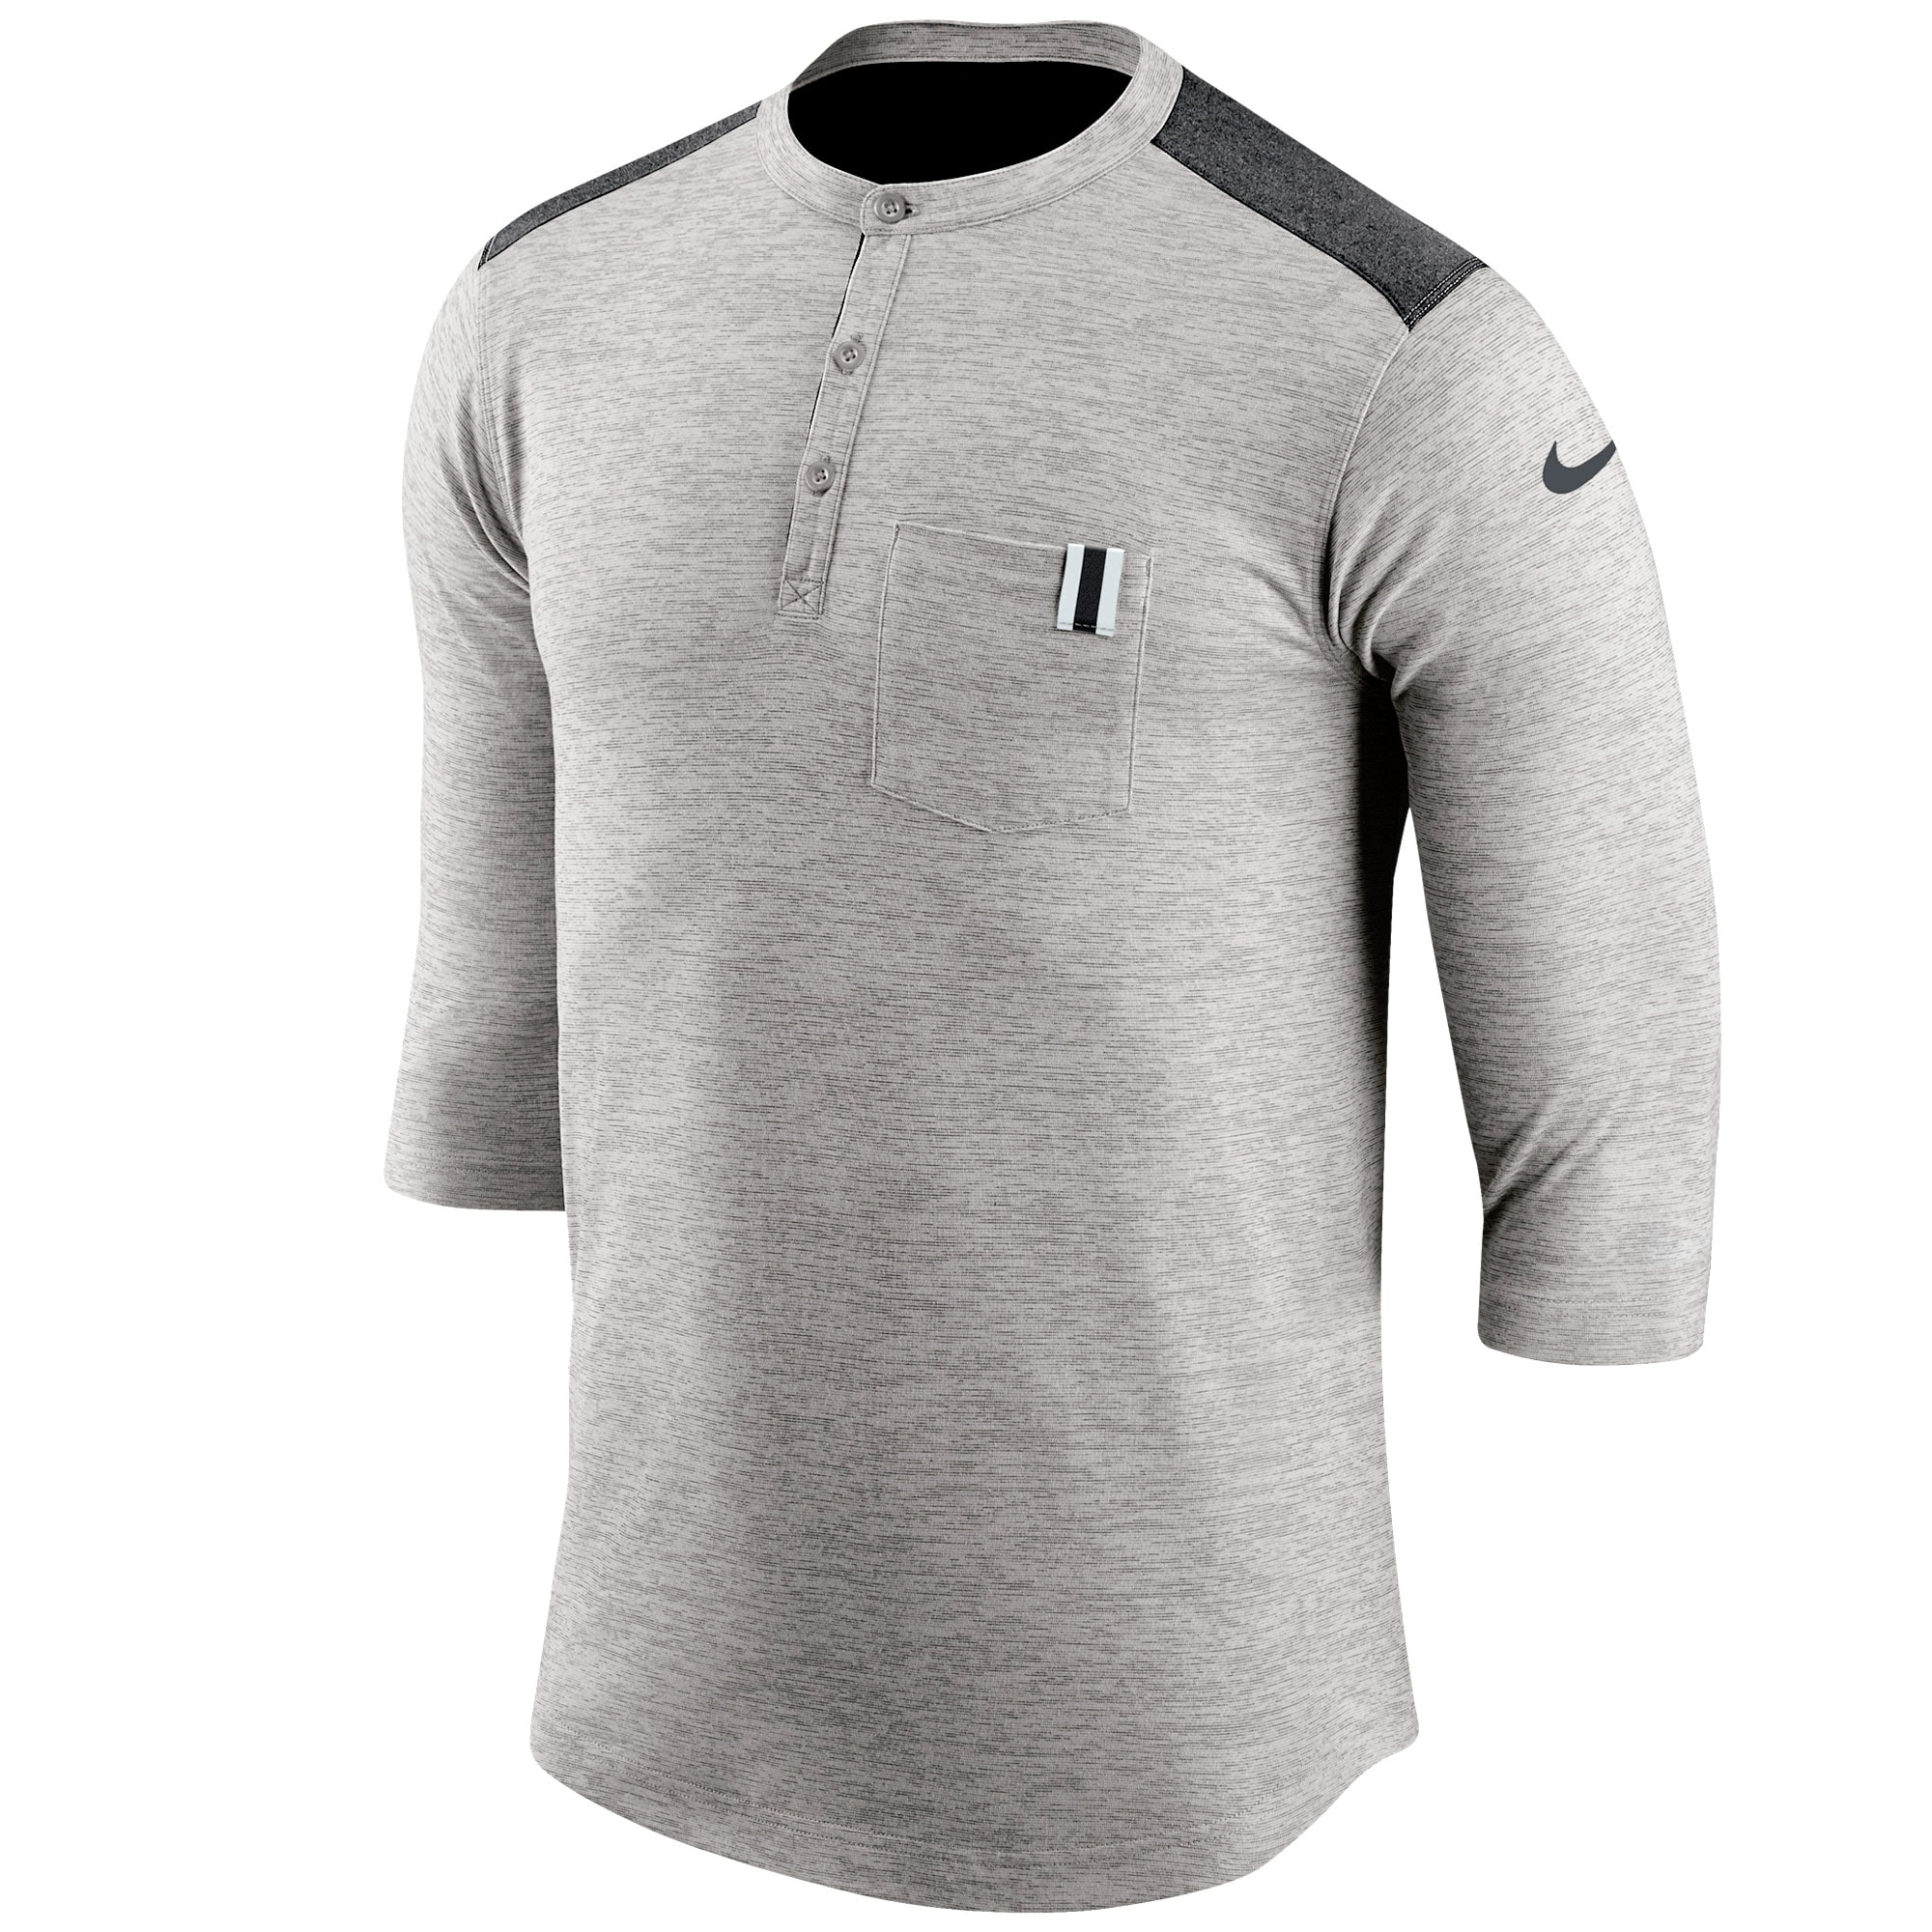 3/4 sleeve nike shirt